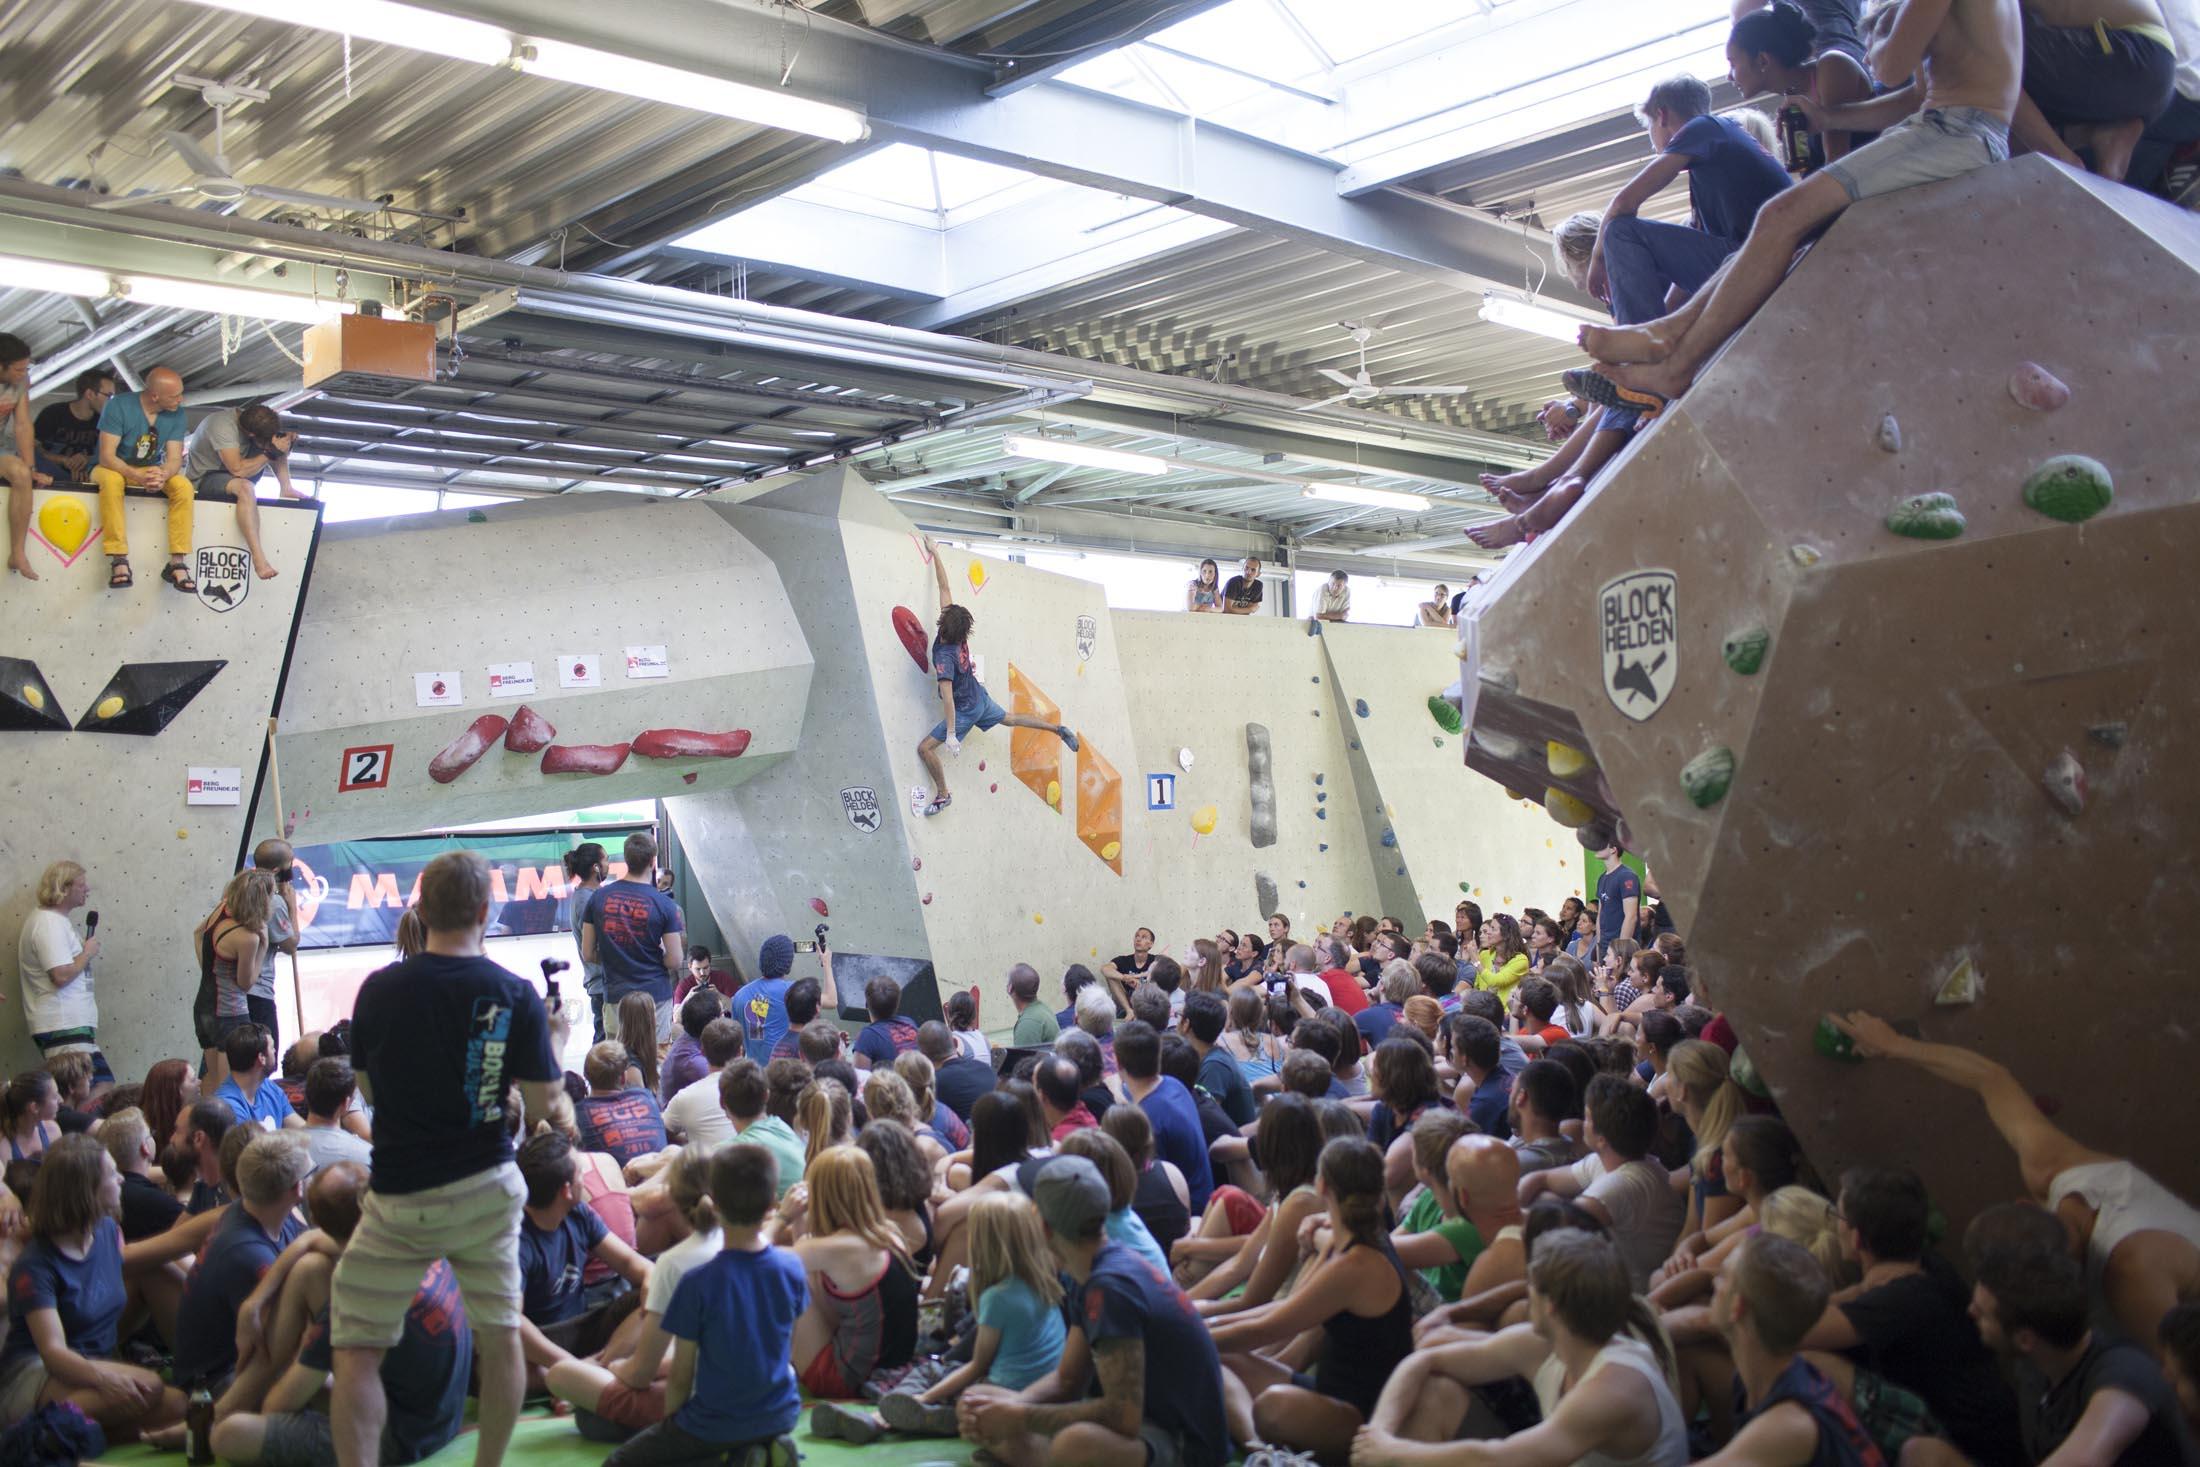 Finale, internationaler bouldercup Frankenjura 2016, BLOCKHELDEN Erlangen, Mammut, Bergfreunde.de, Boulderwettkampf07092016616